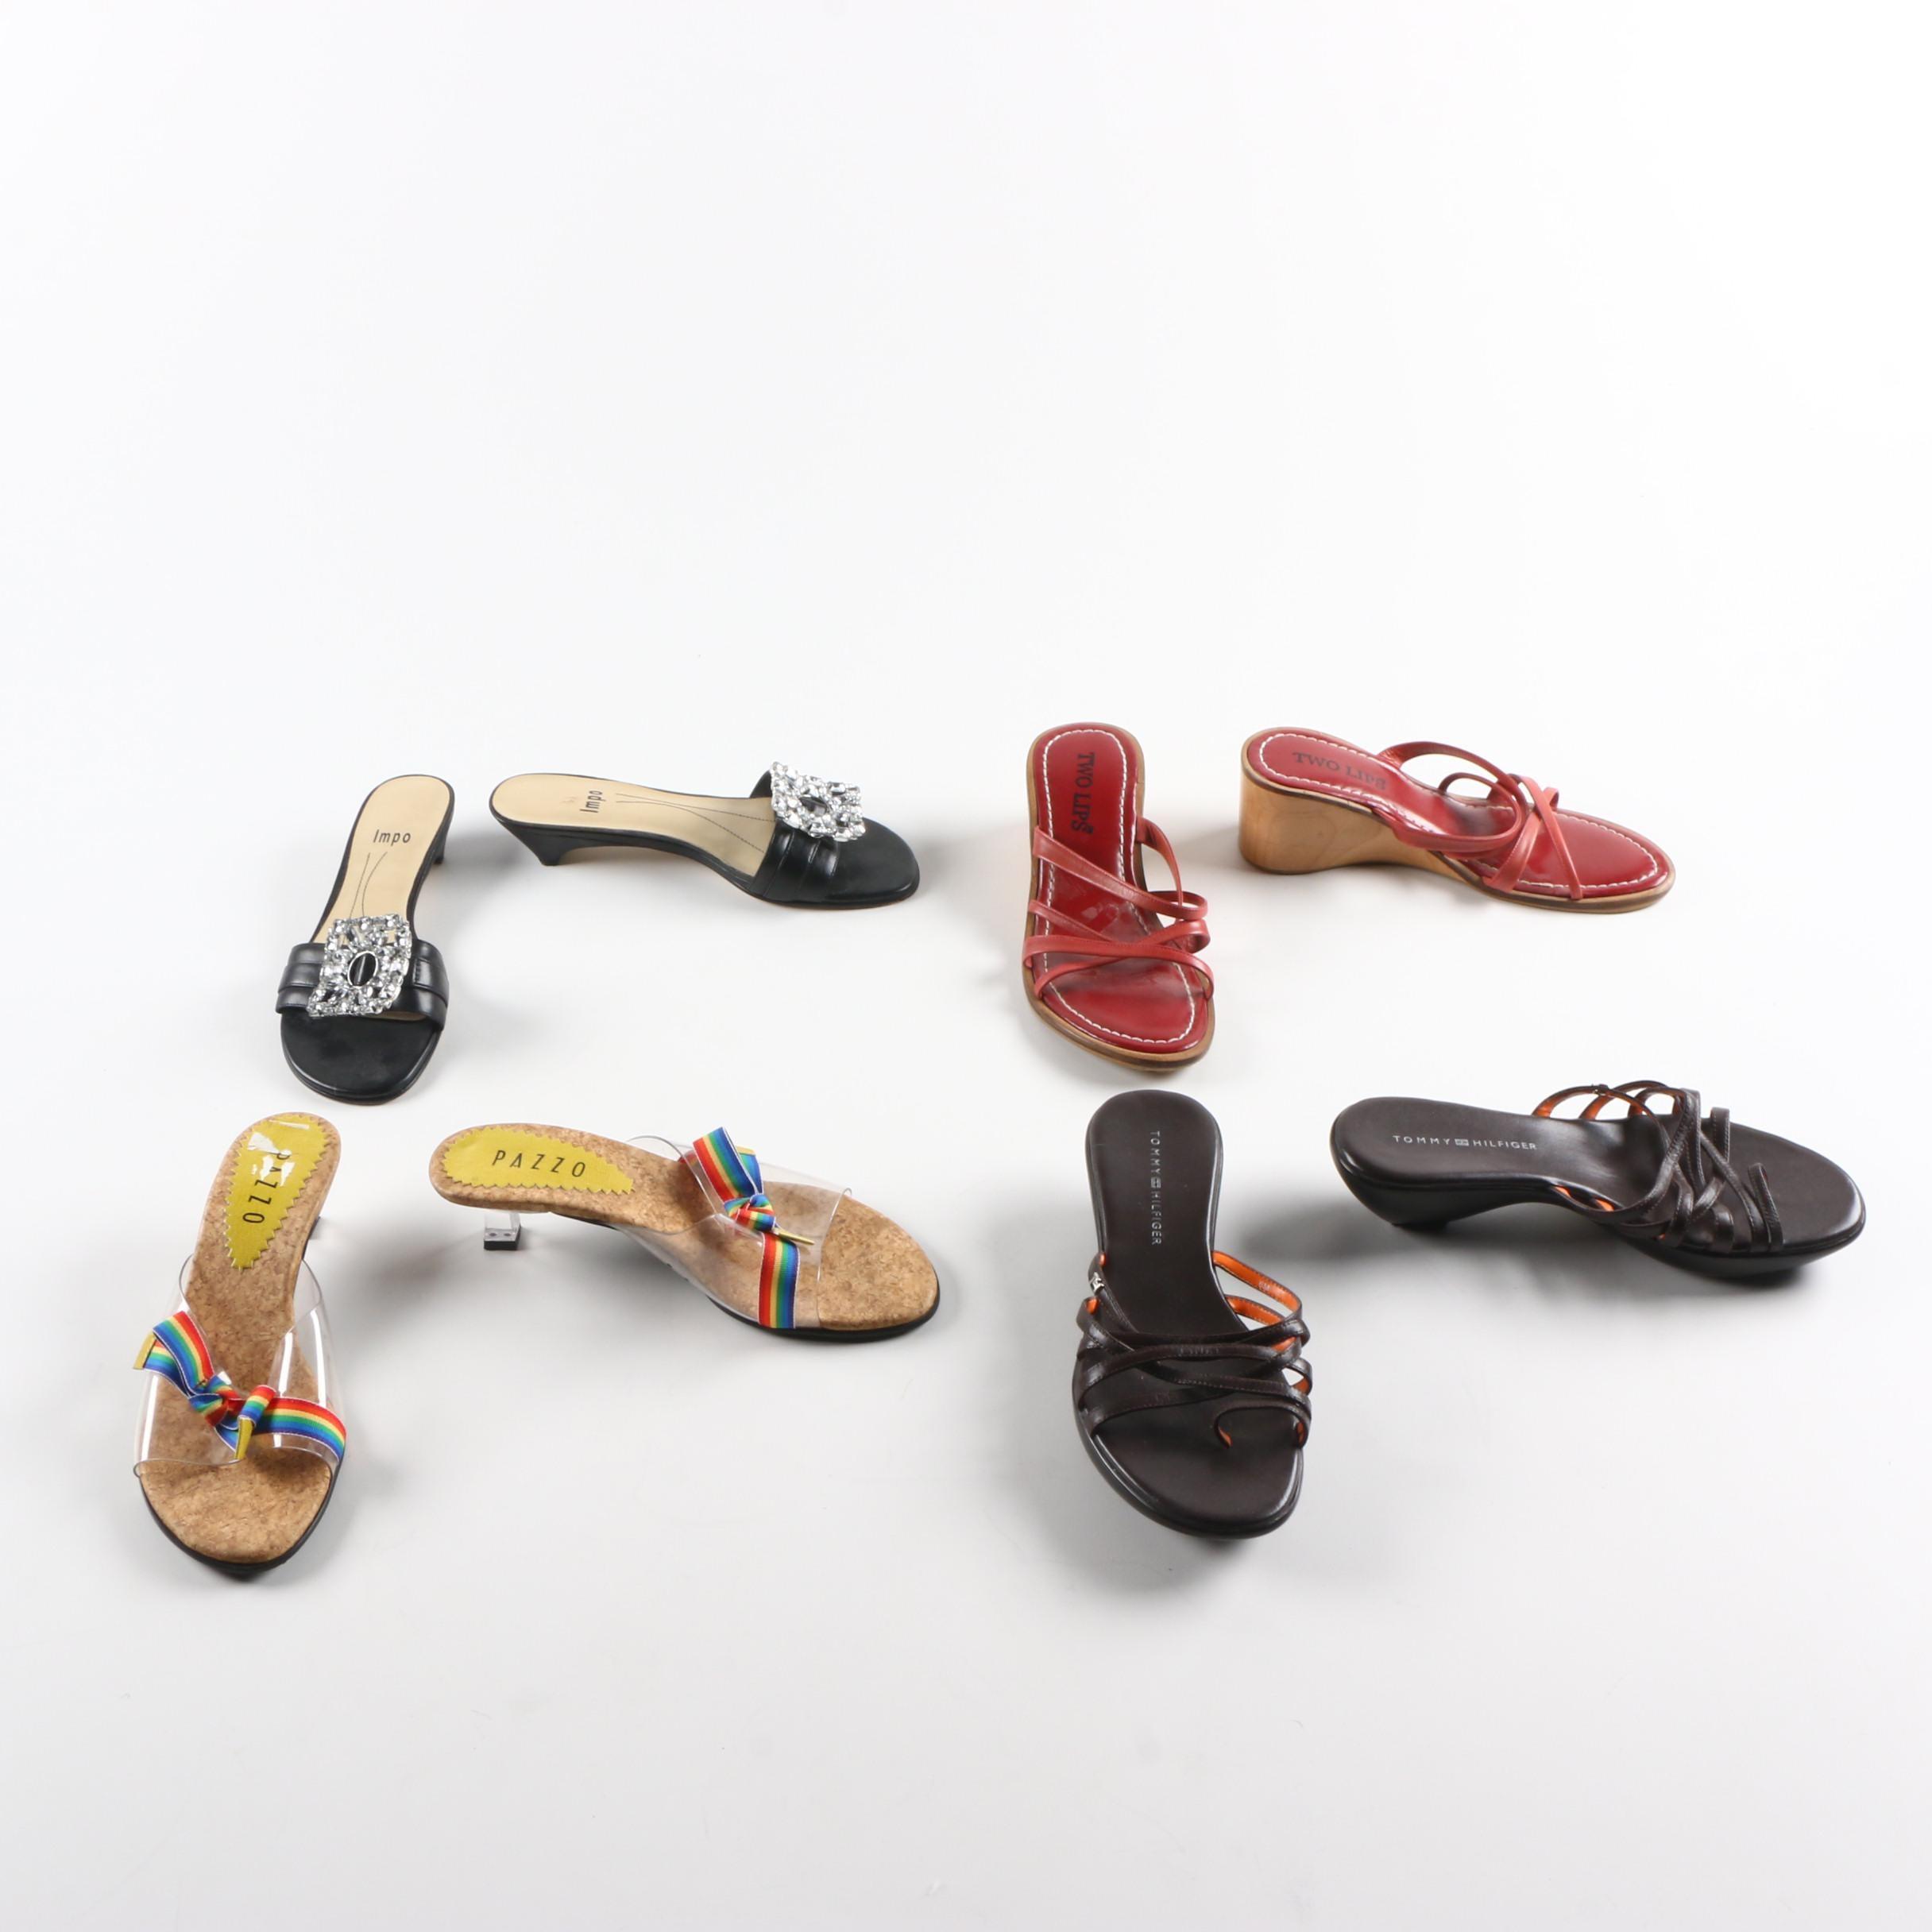 Assortment of Sandals